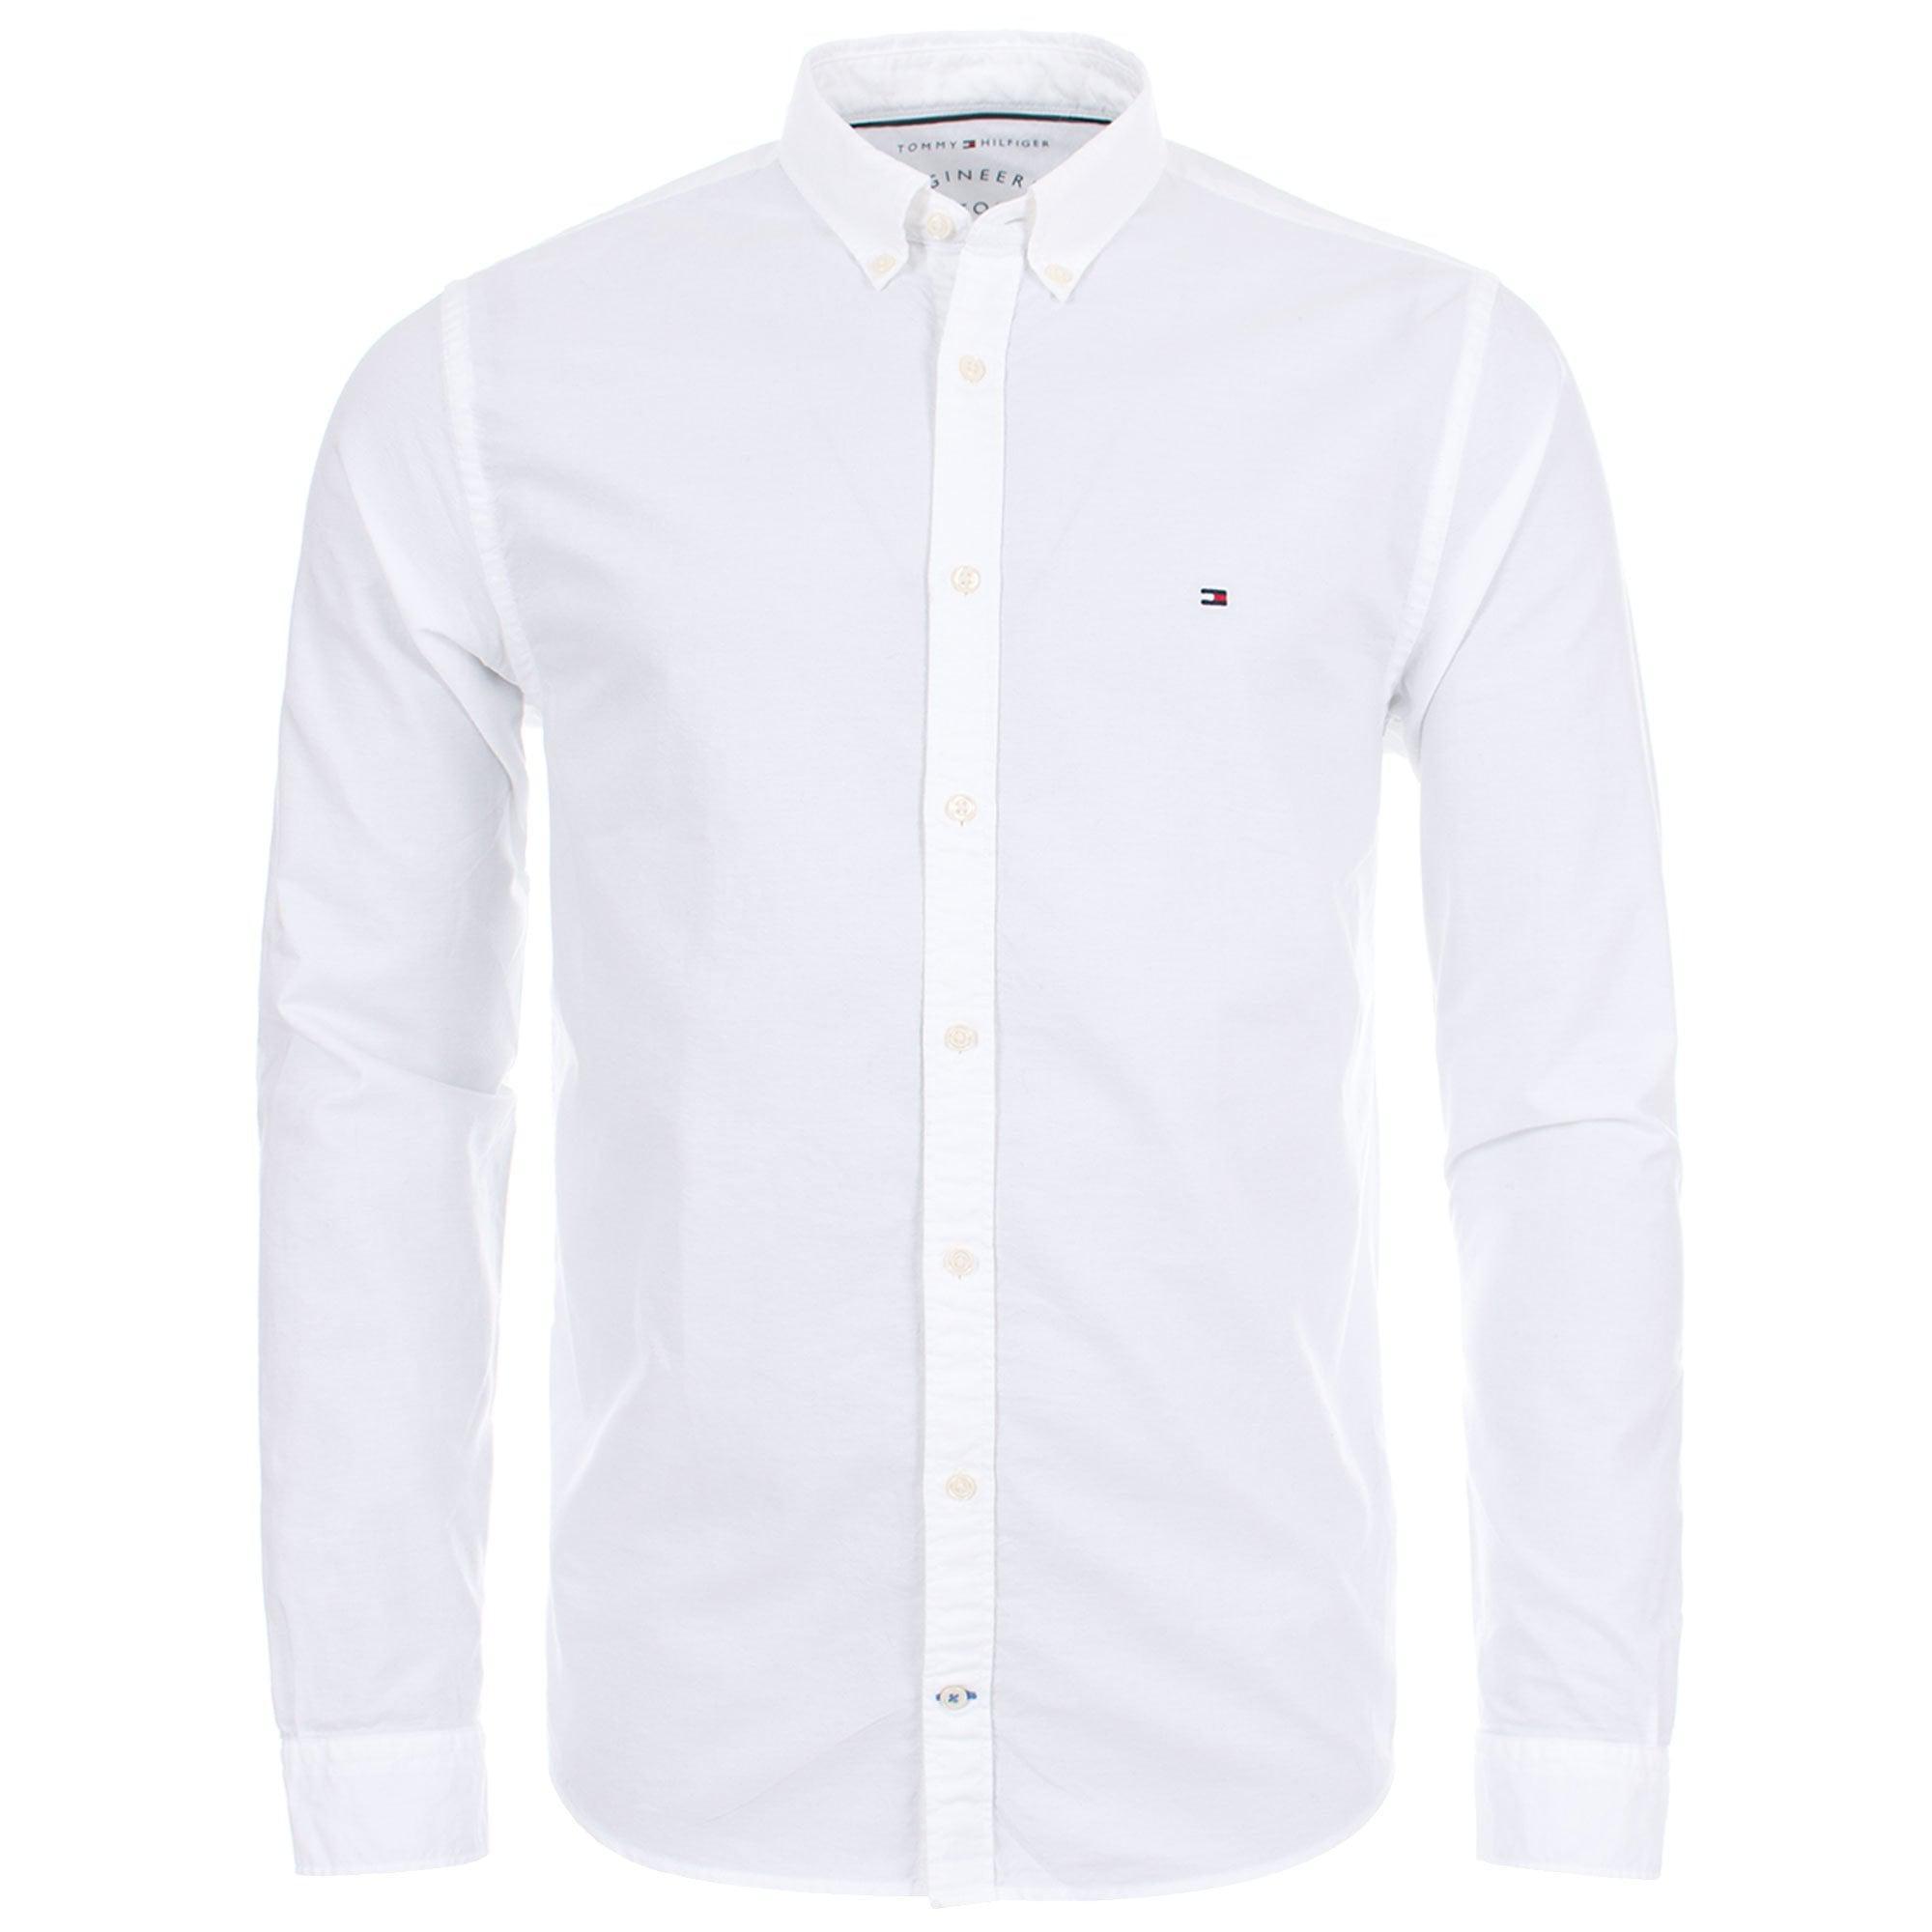 4504229da271 Tommy Hilfiger Engineered Shirt in White for Men - Lyst